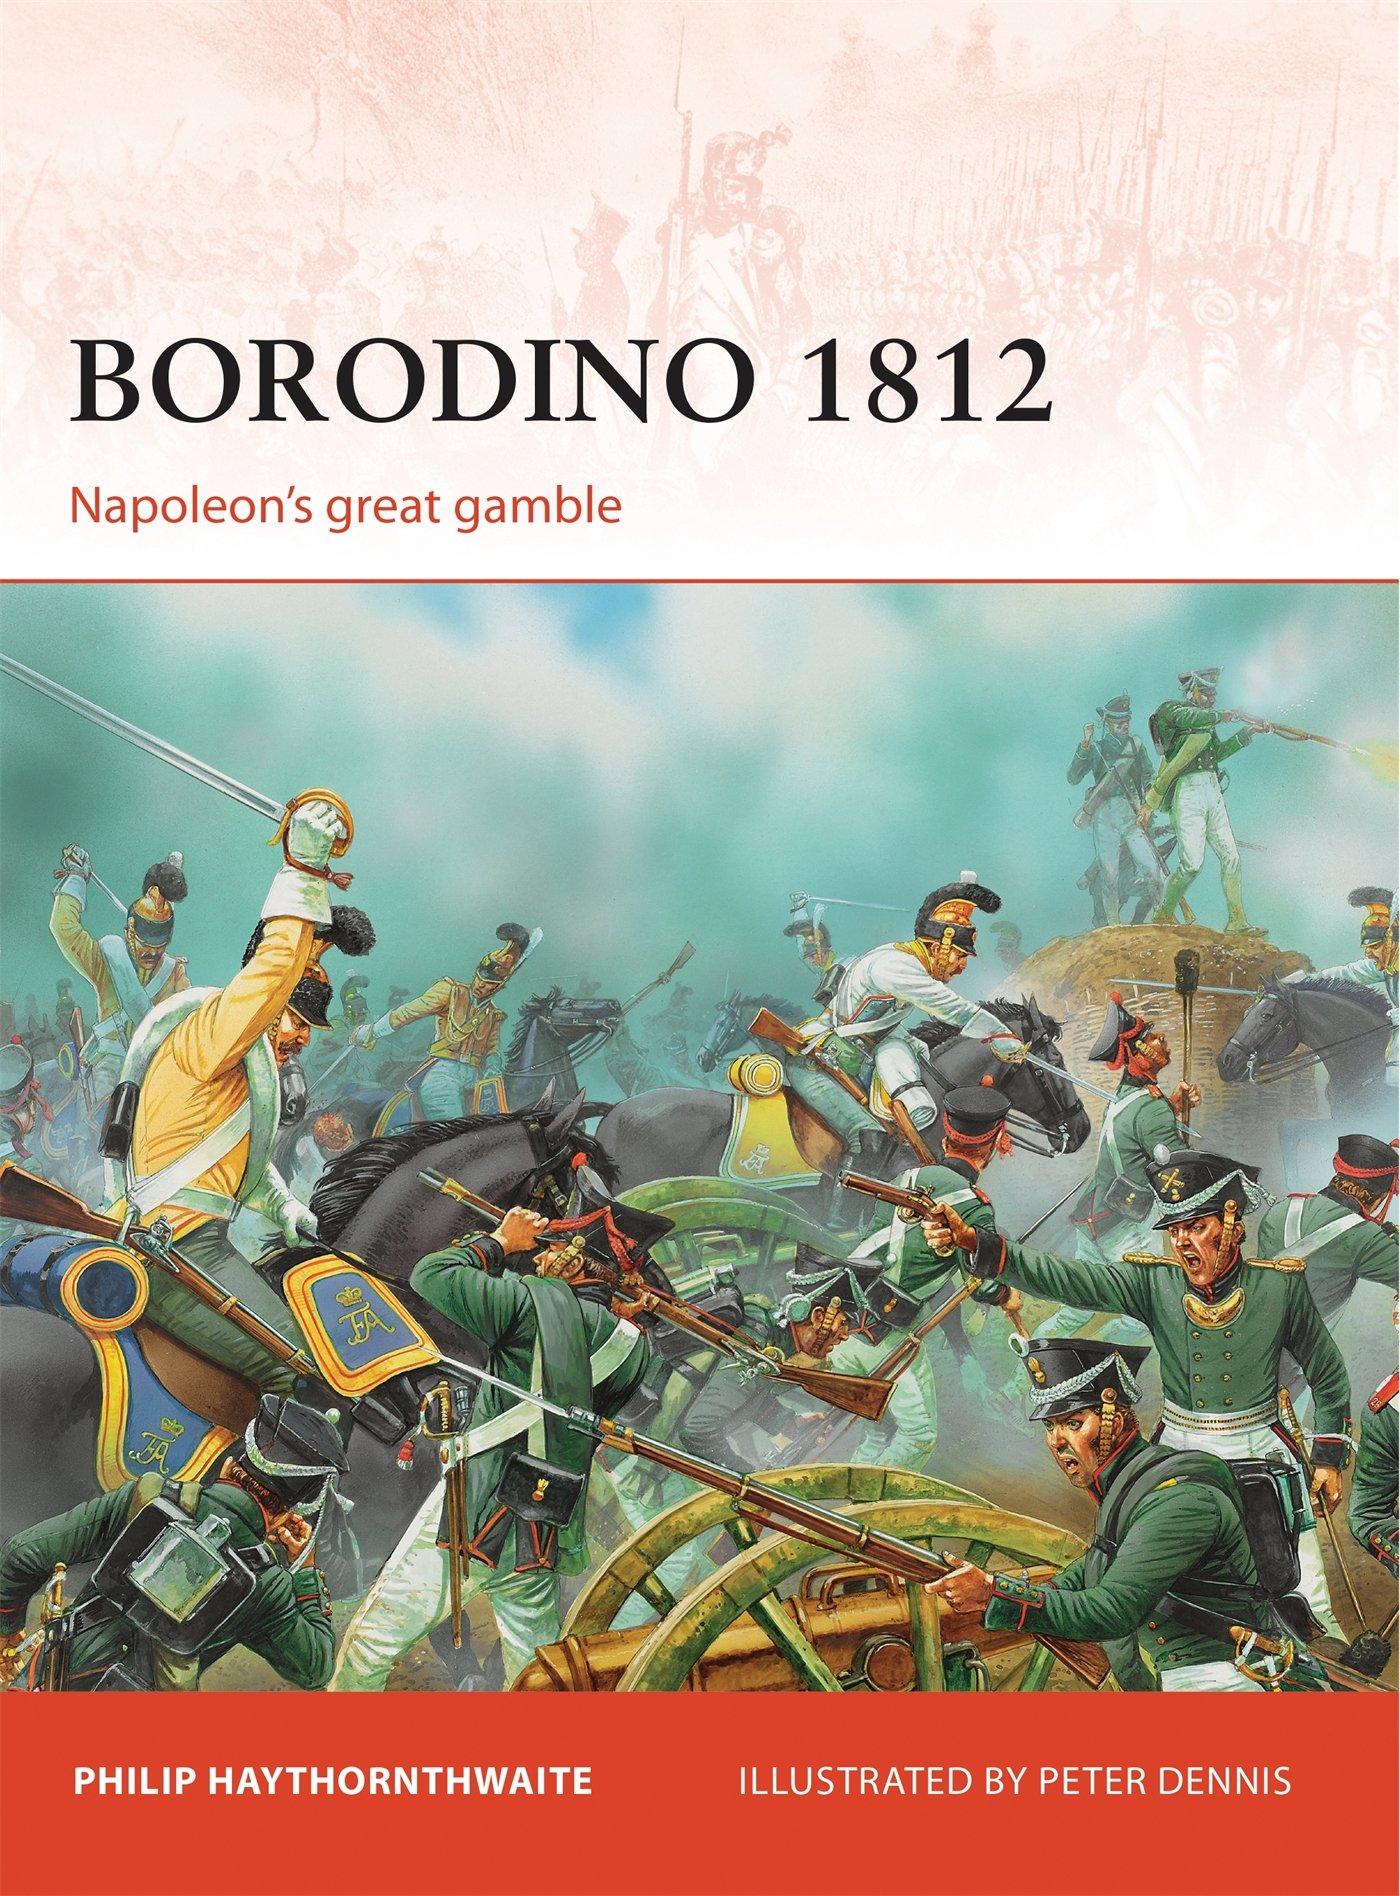 Borodino 1812: Napoleon's great gamble (Campaign): Philip Haythornthwaite,  Peter Dennis: 9781849086967: Amazon.com: Books